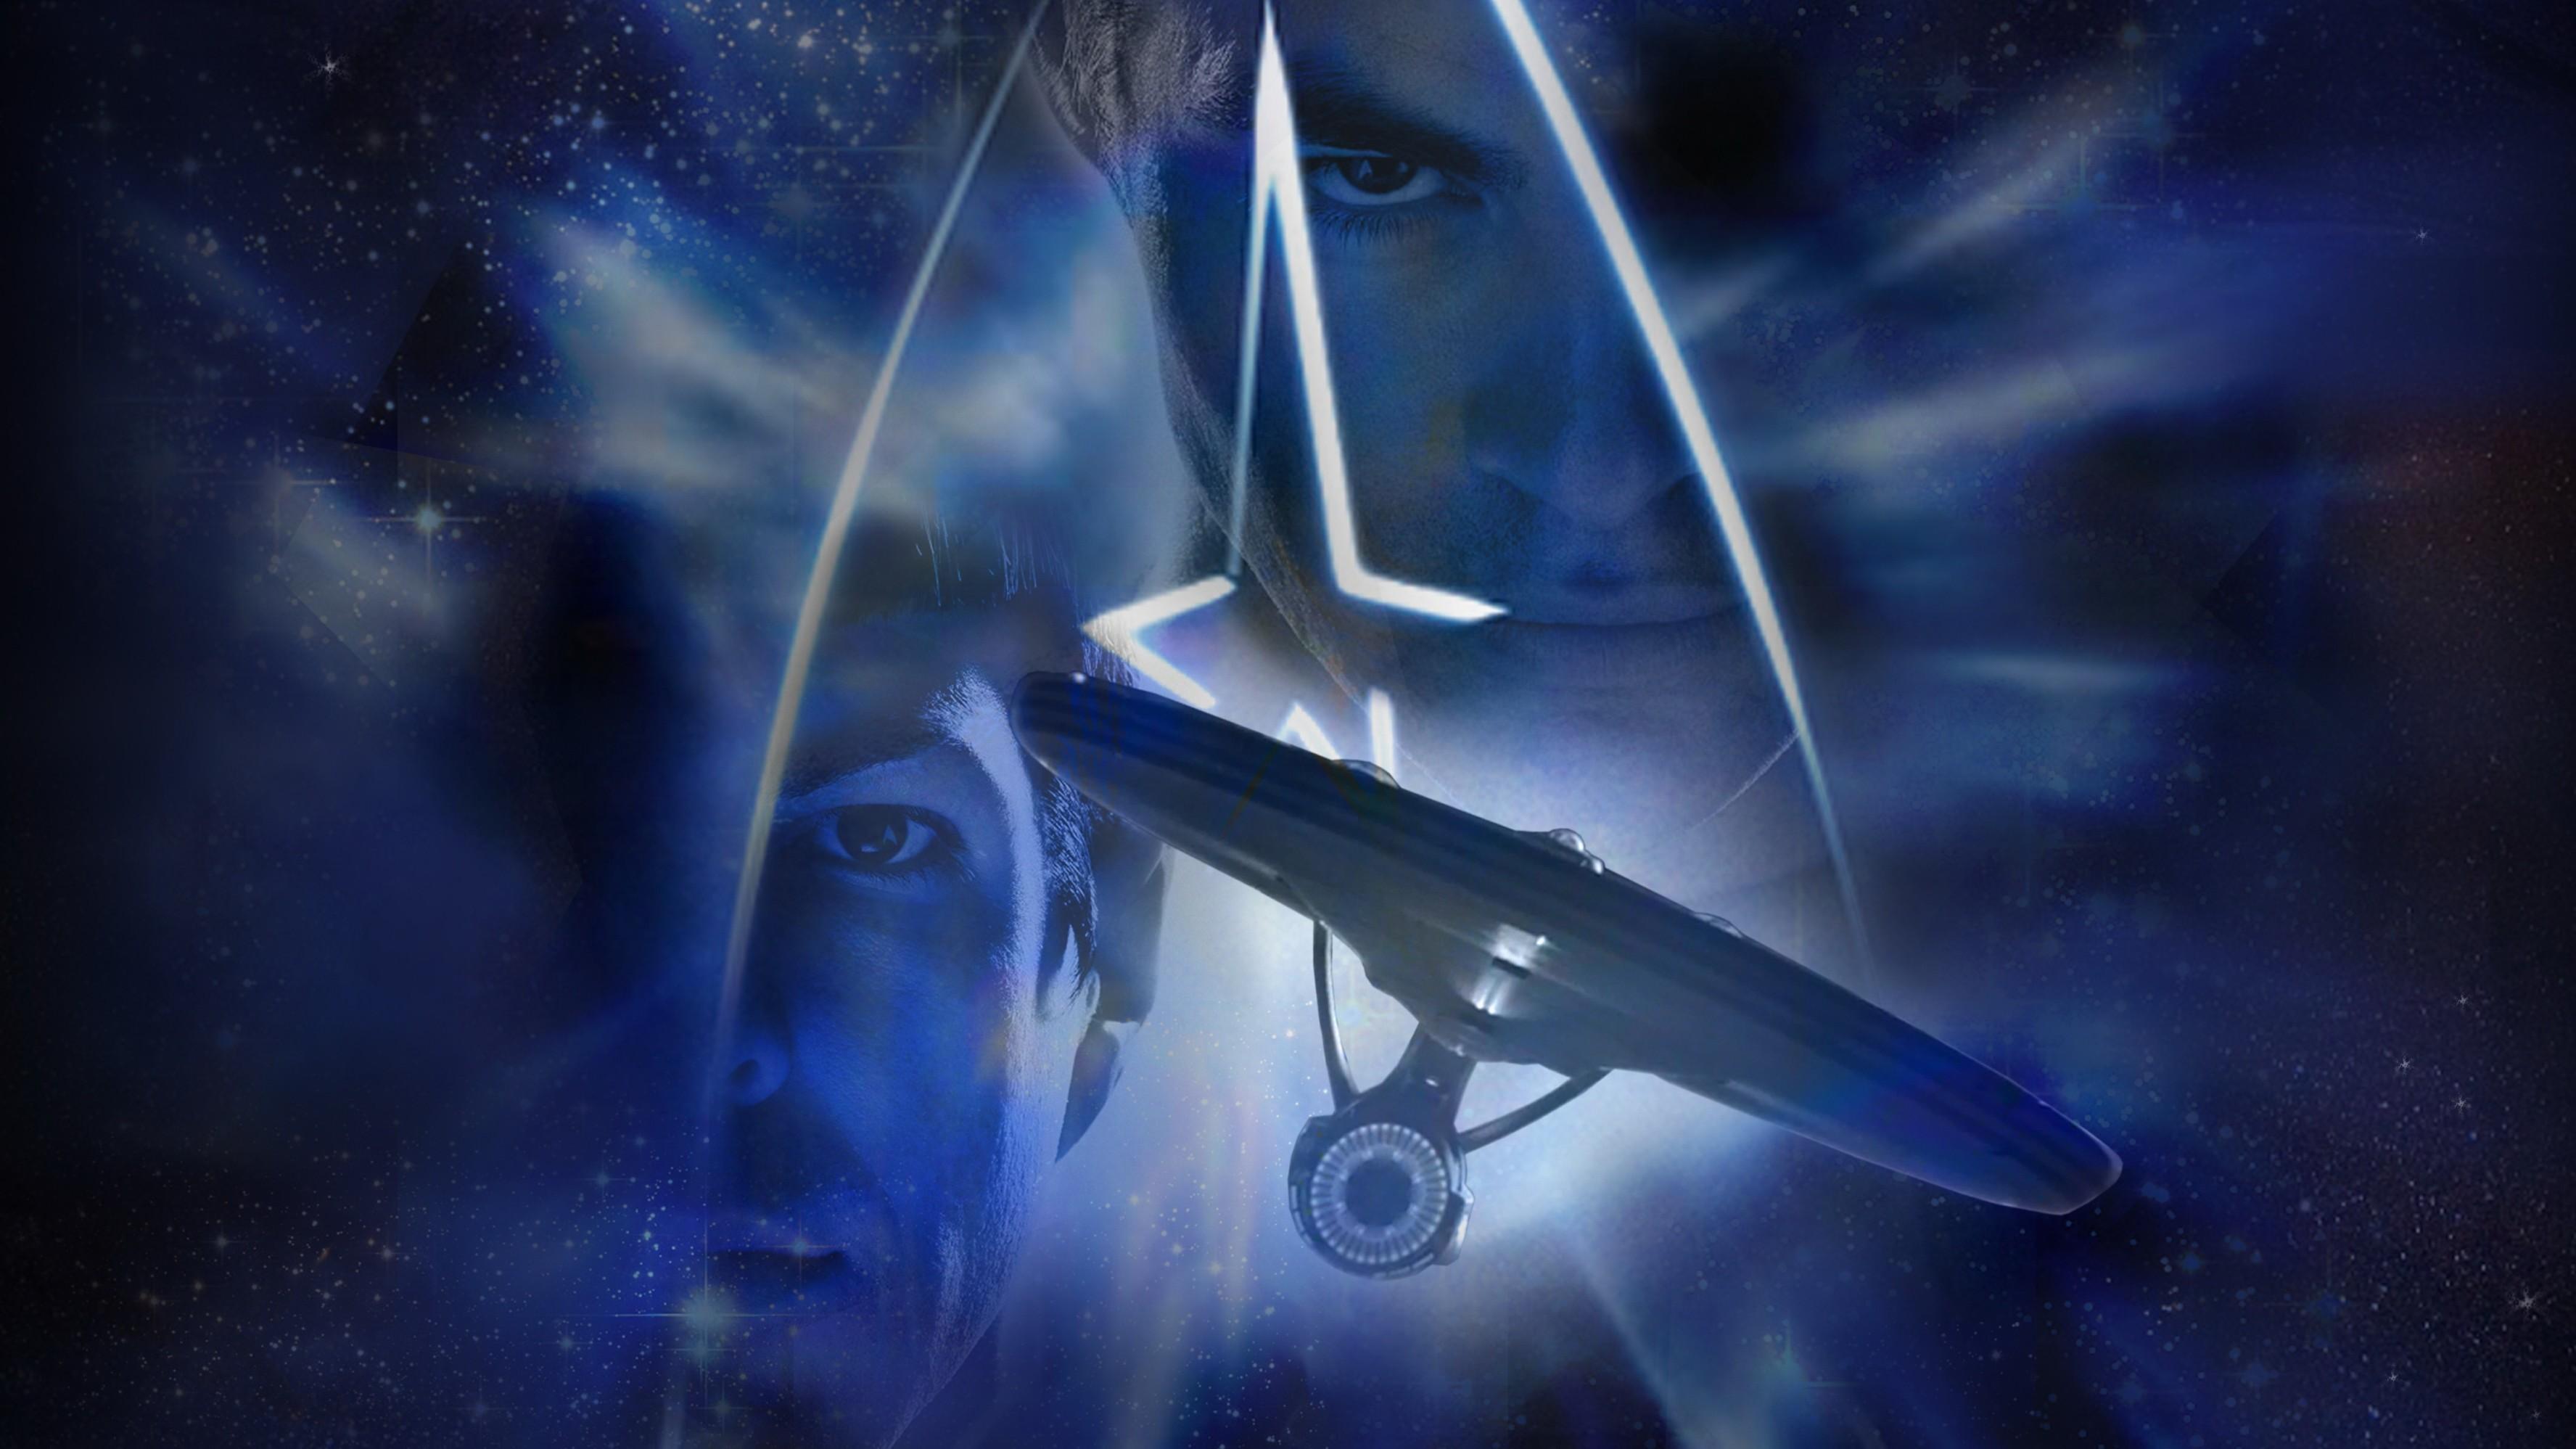 Star Trek Into Darkness Star Trek 4K Ultra Hd Spunky Wallpaper .